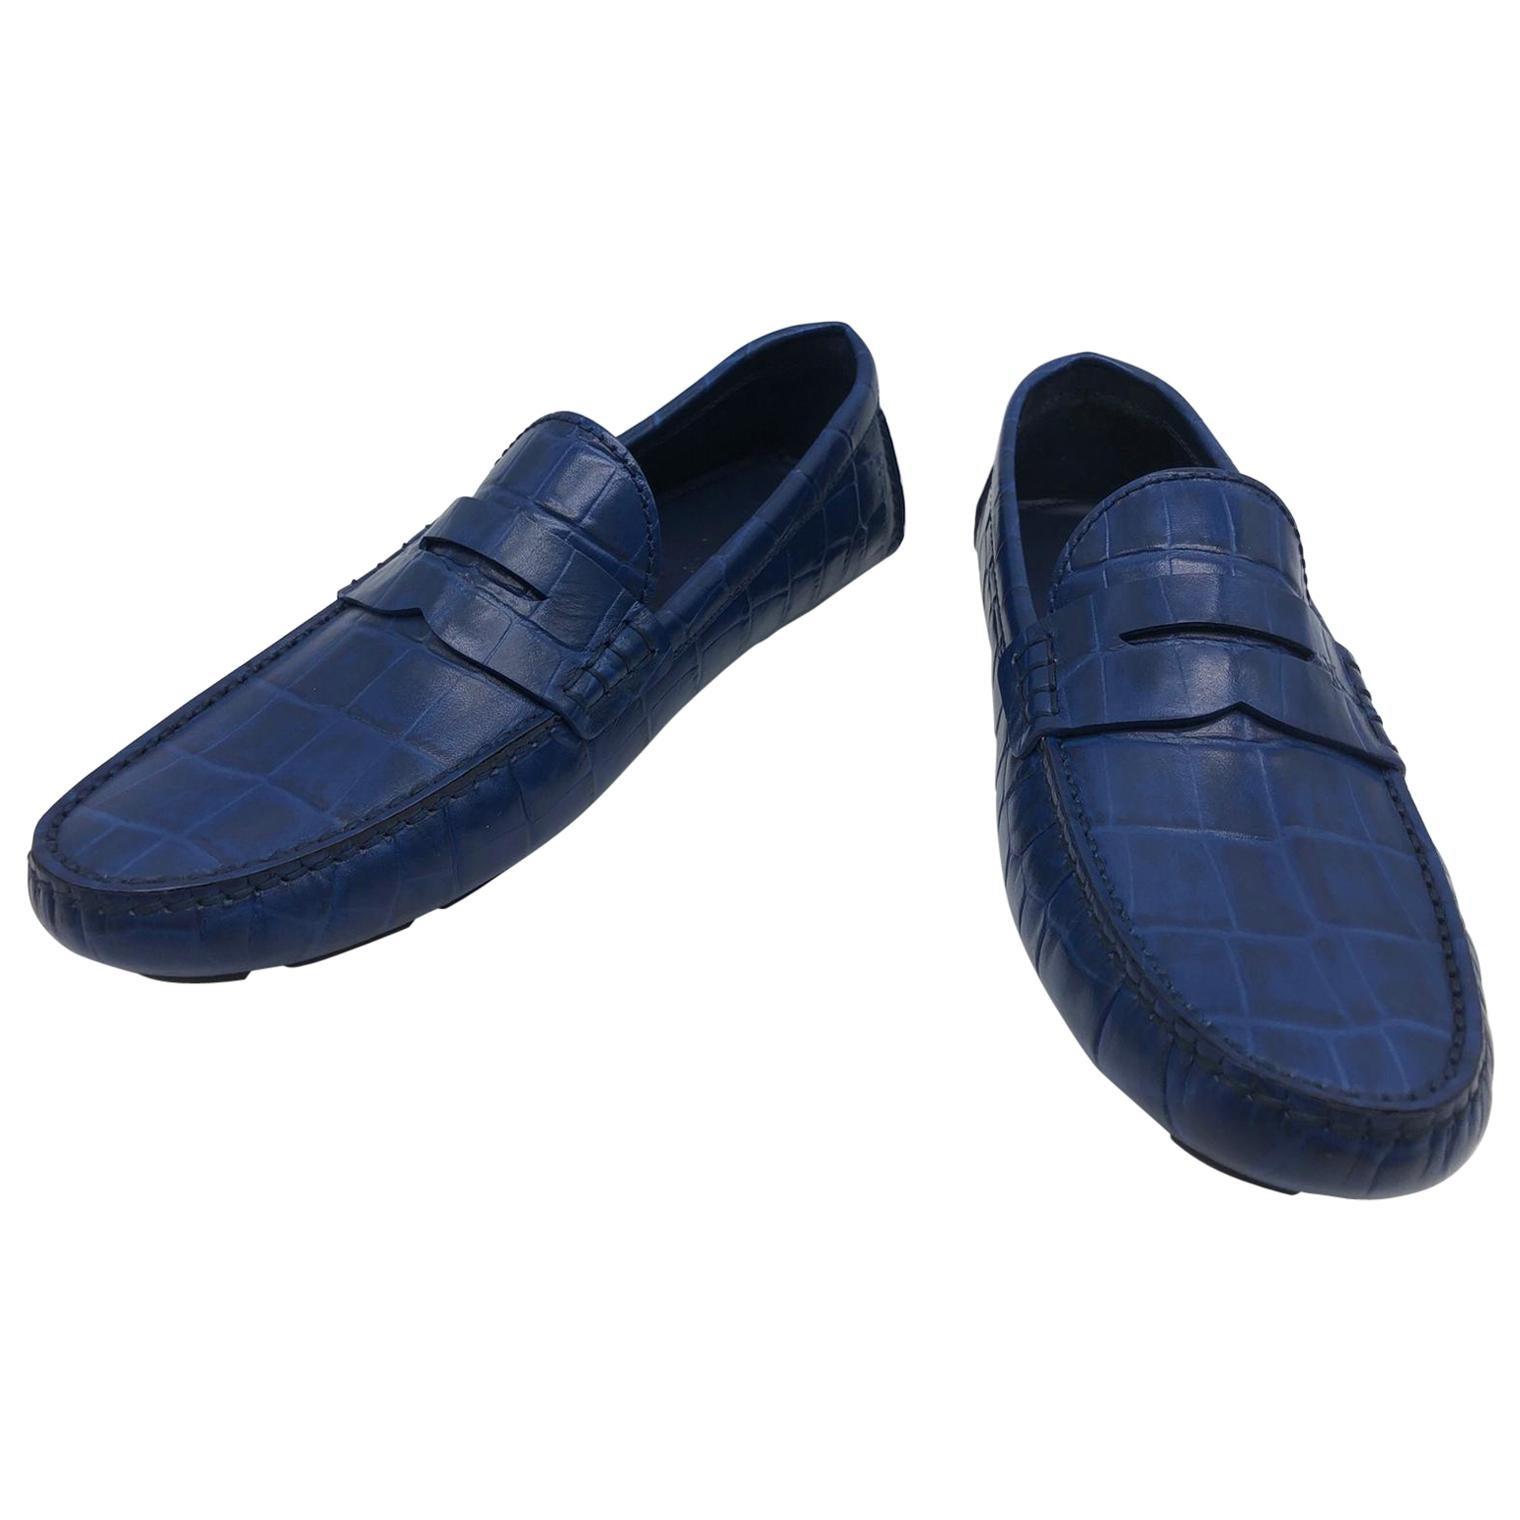 Louis vuitton Men Loafers in blue